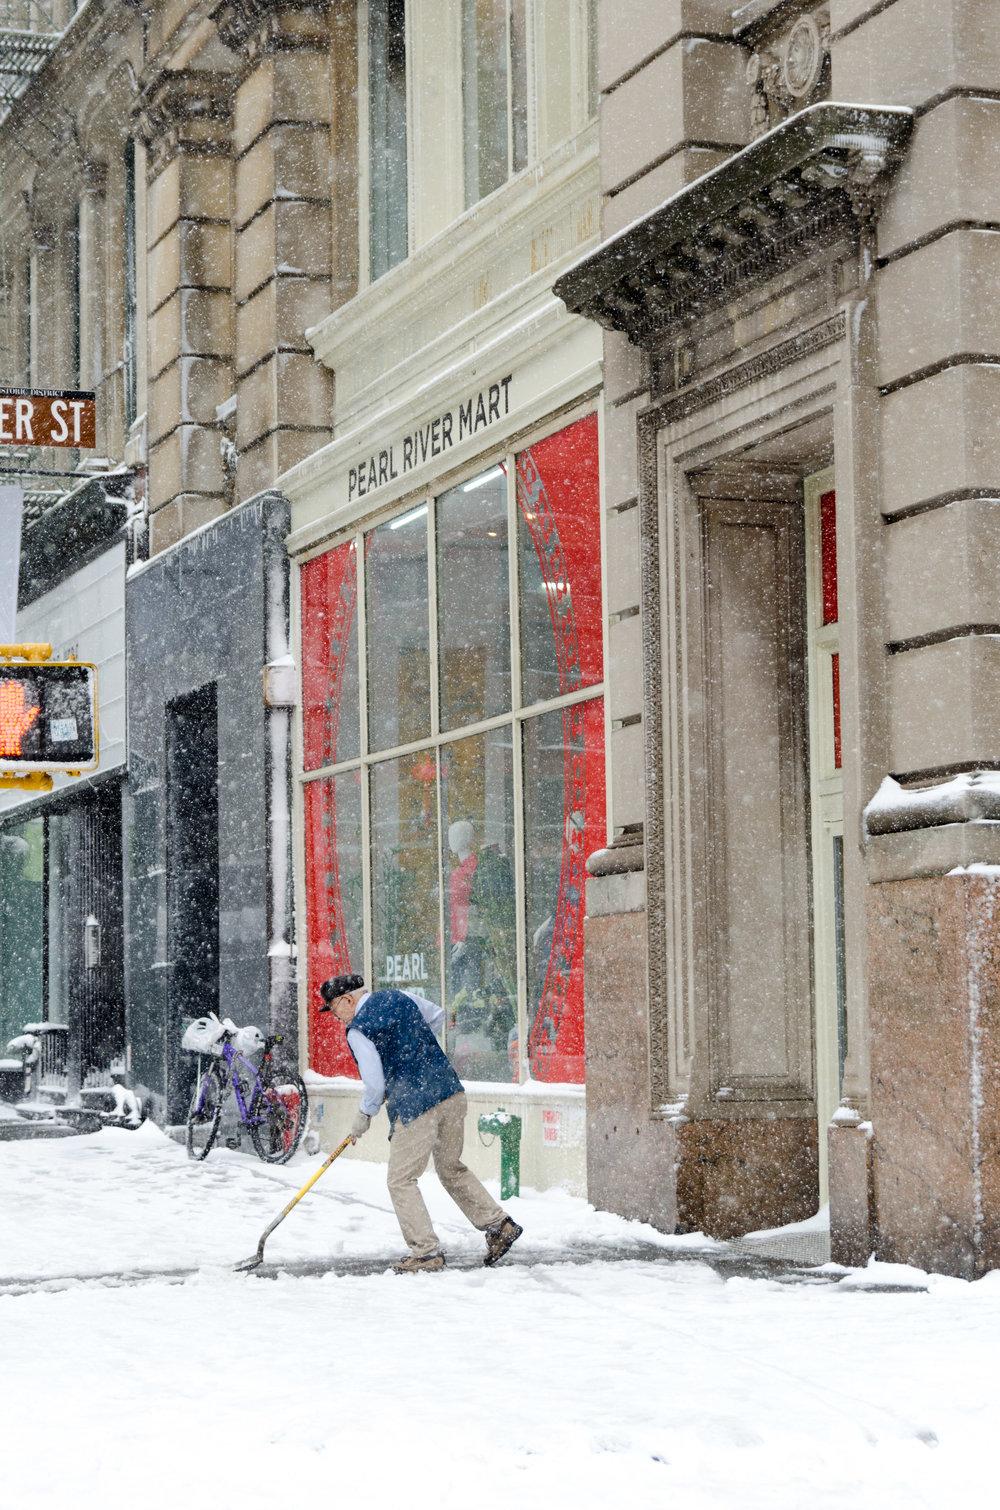 2017-02-09 - Snowstorm-13.jpg